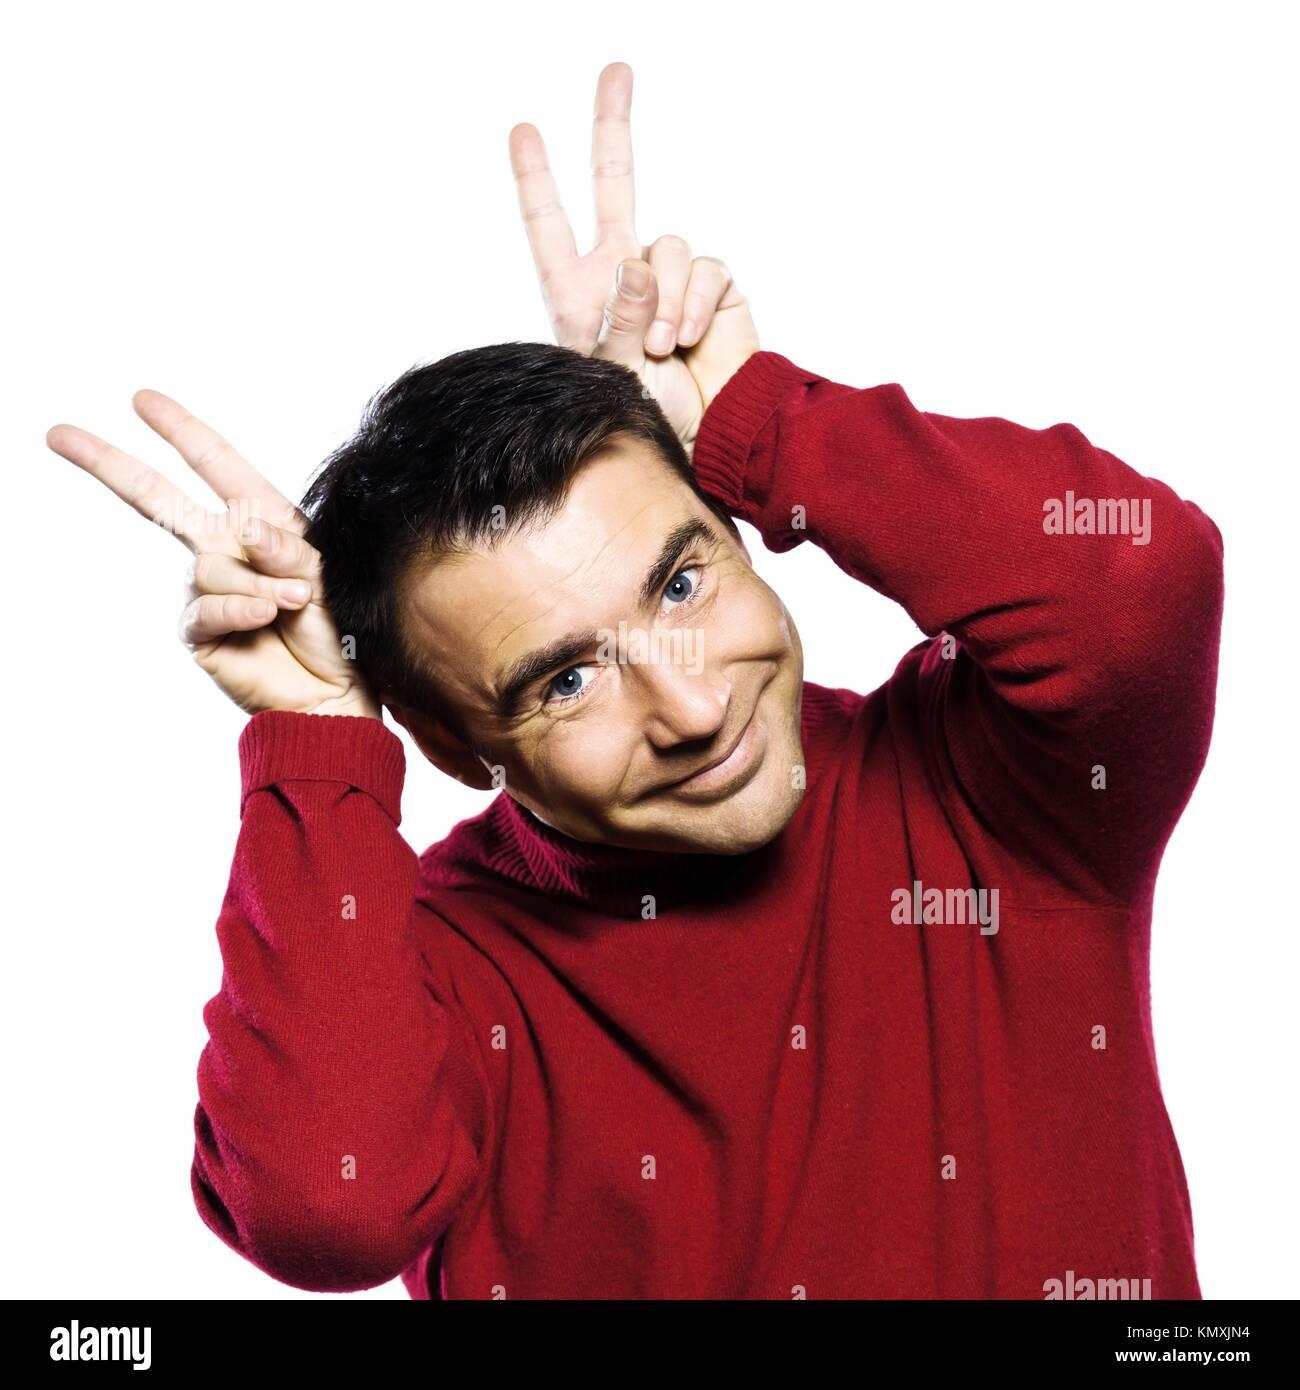 caucasian man gesture studio portrait on isolated white backgound Stock Photo